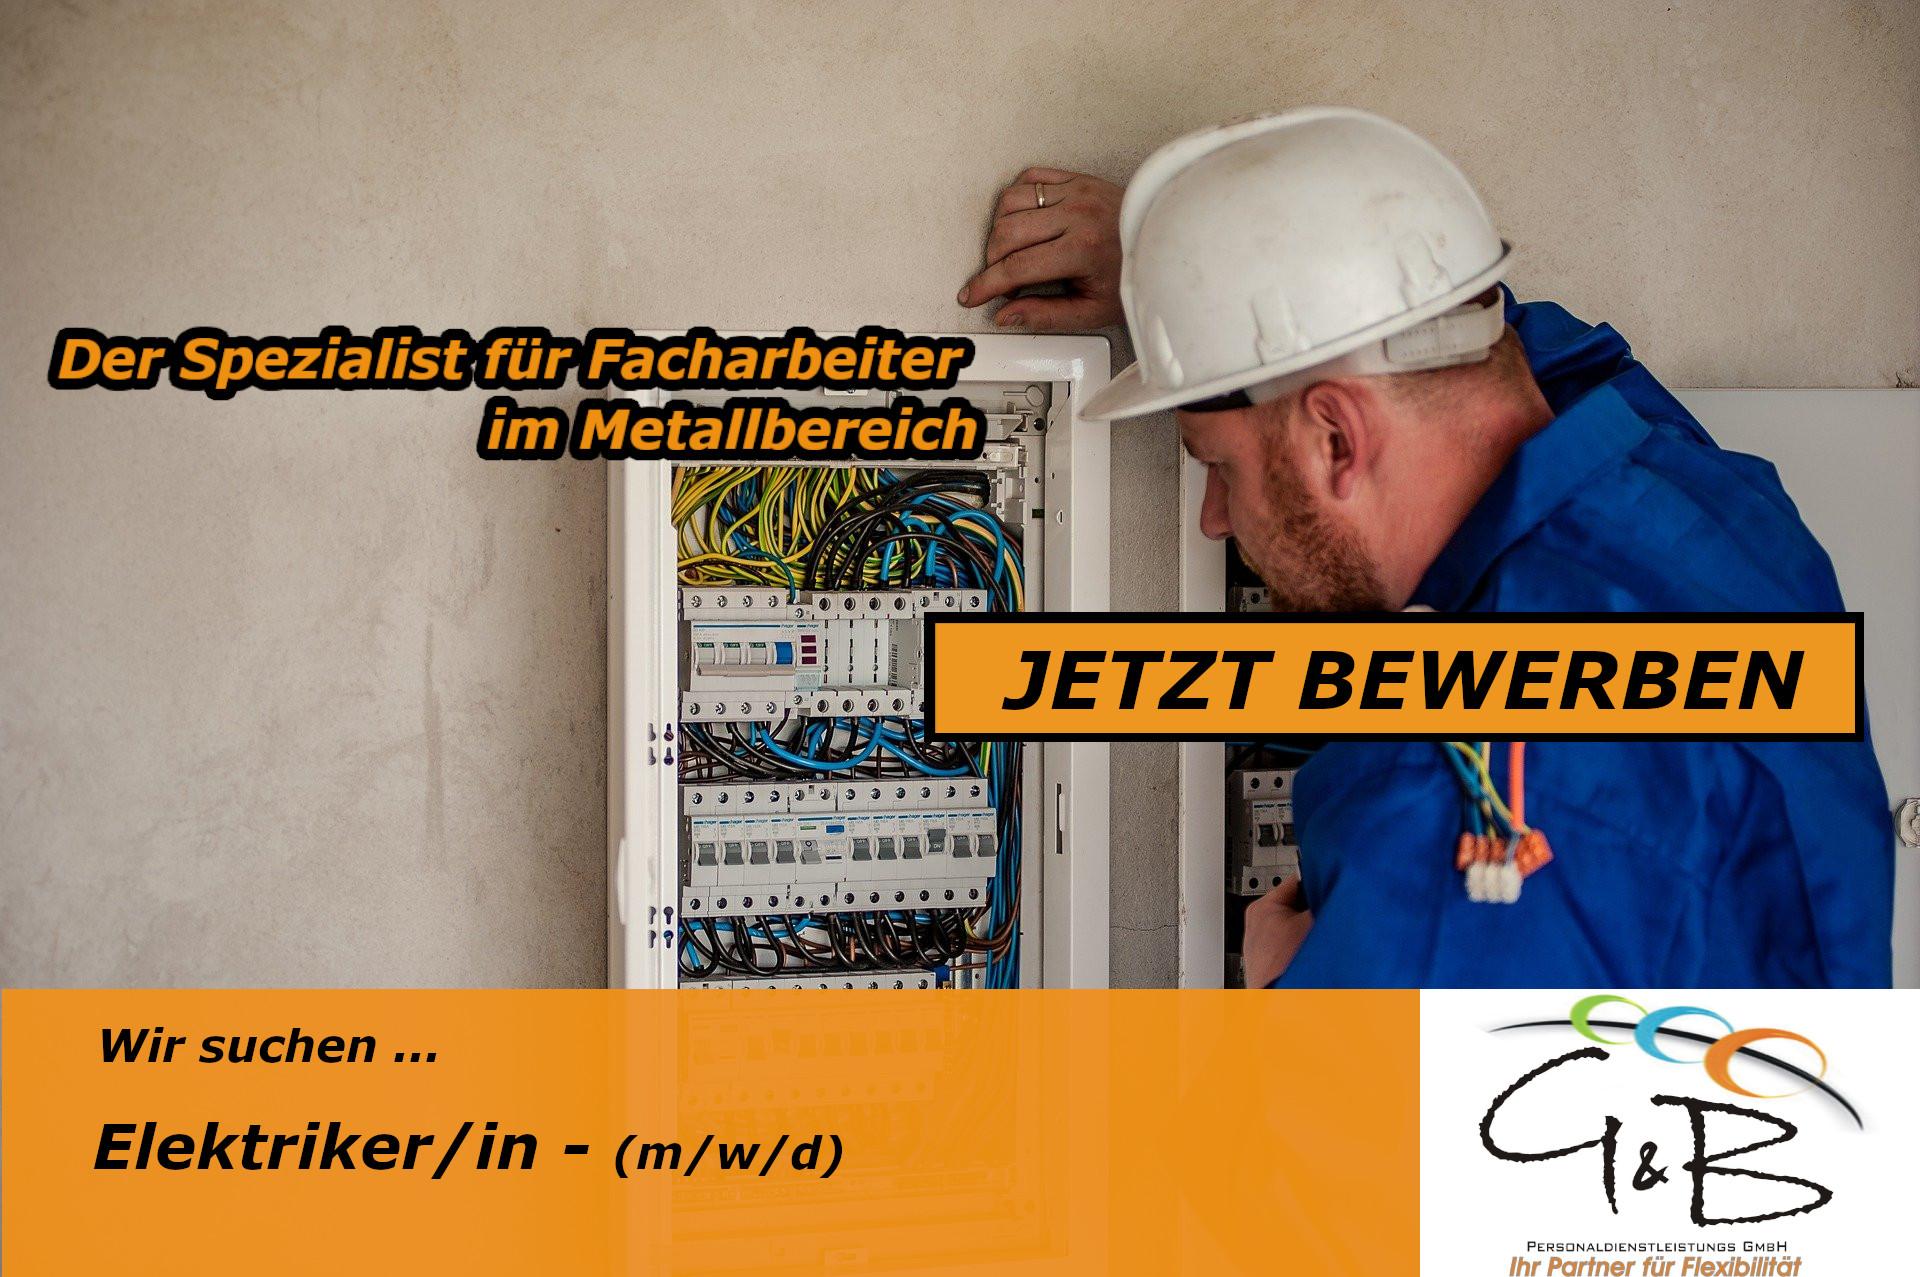 G&B_Elektriker